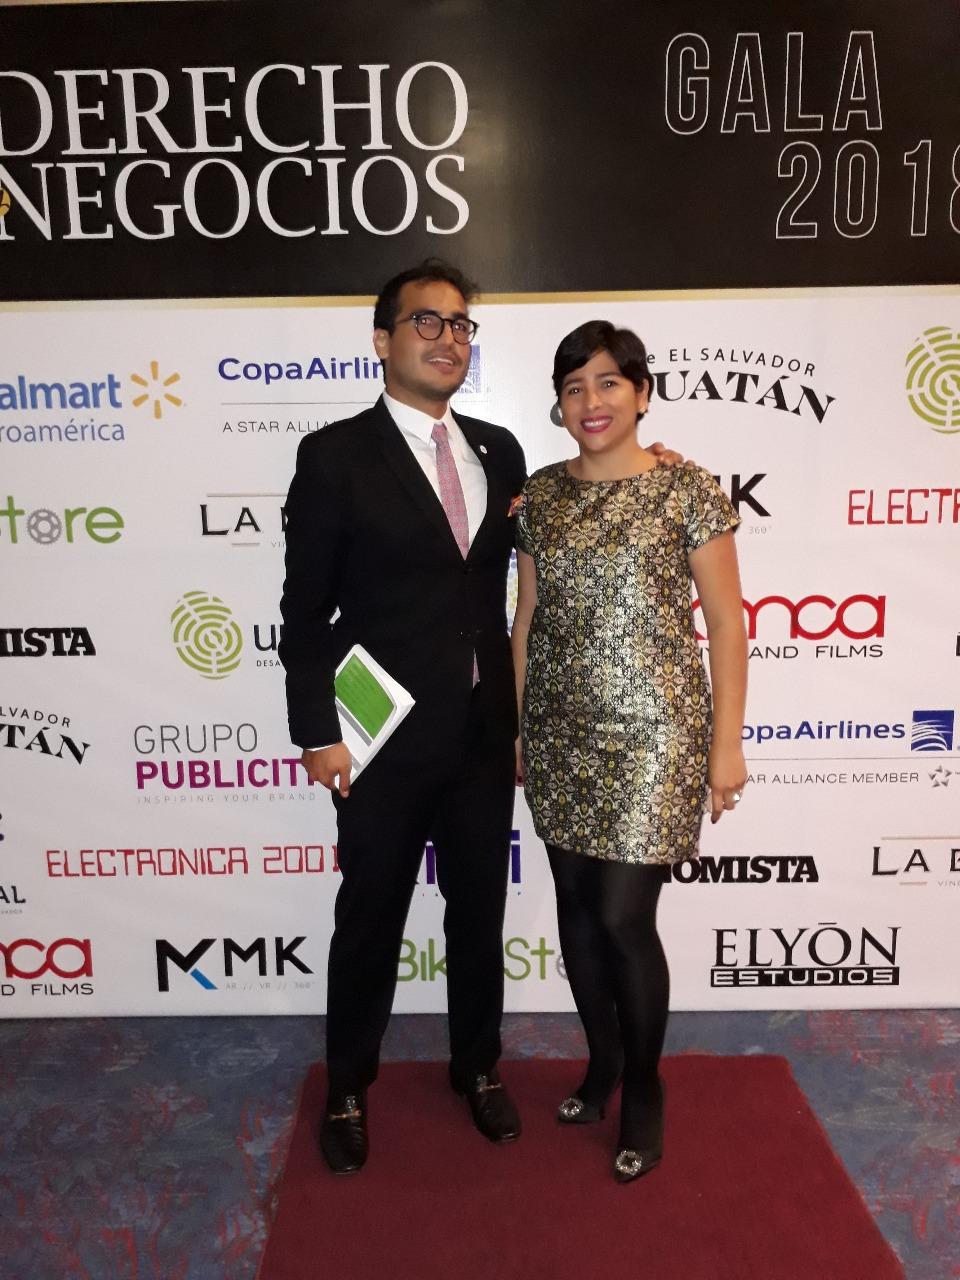 Herman Duarte junto con la periodista Claudia Espinoza